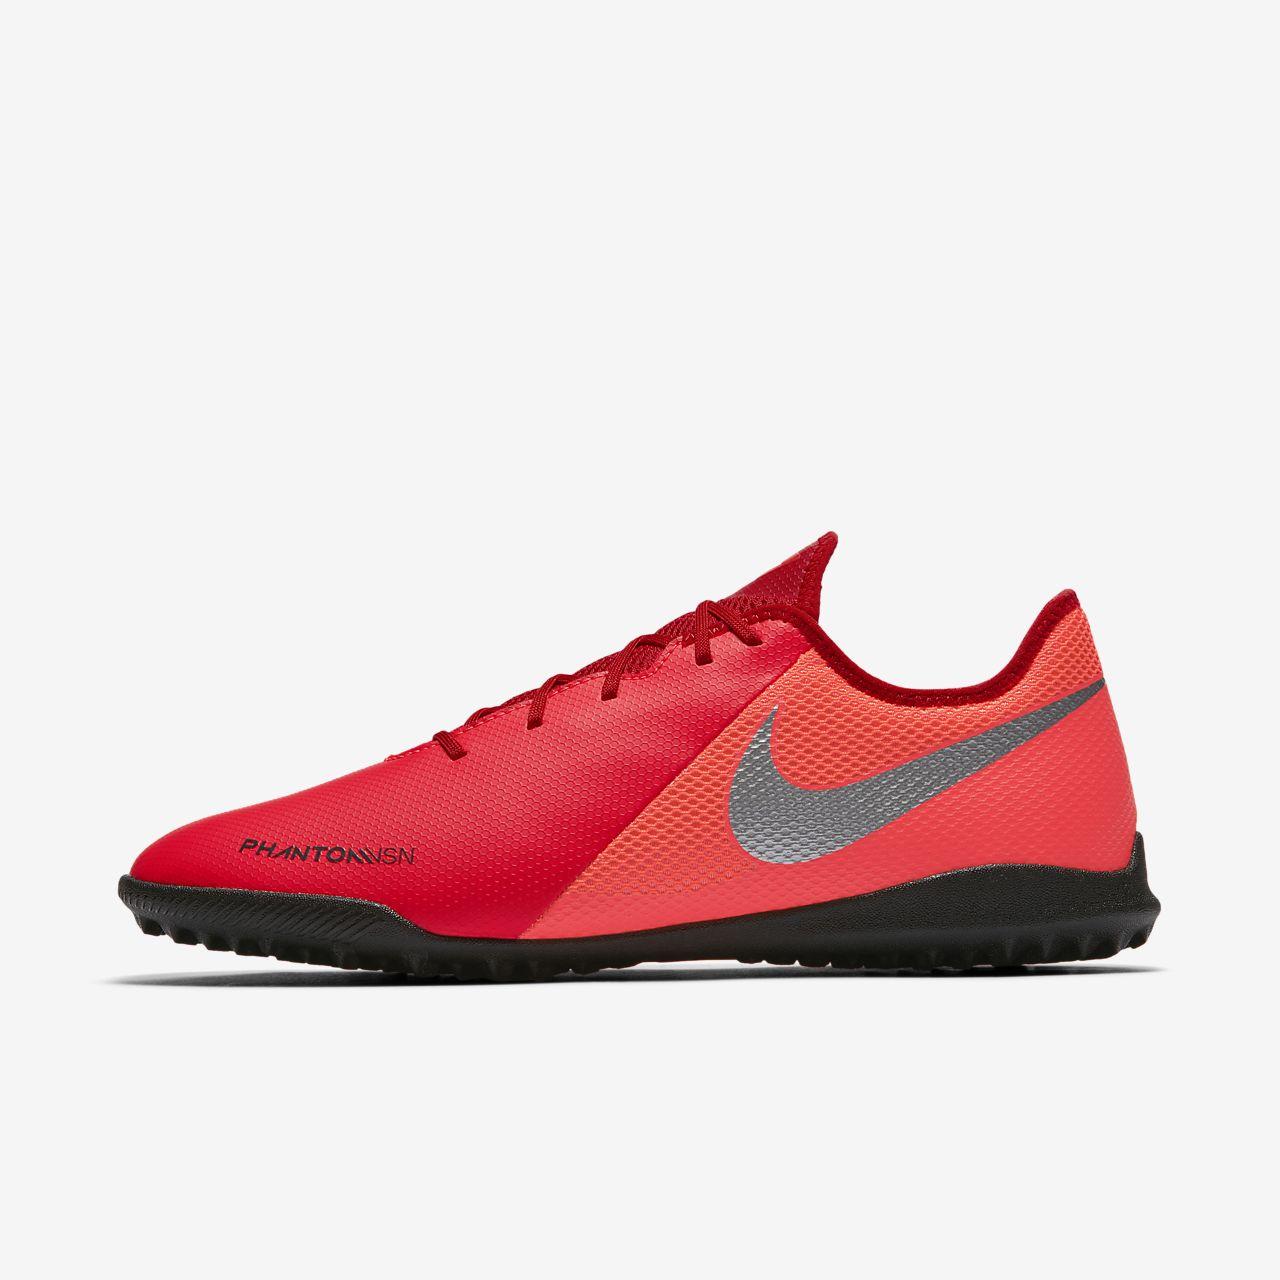 new concept cf0ad 3f460 Nike Phantom Vision Academy Artificial-Turf Football Boot. Nike.com GB